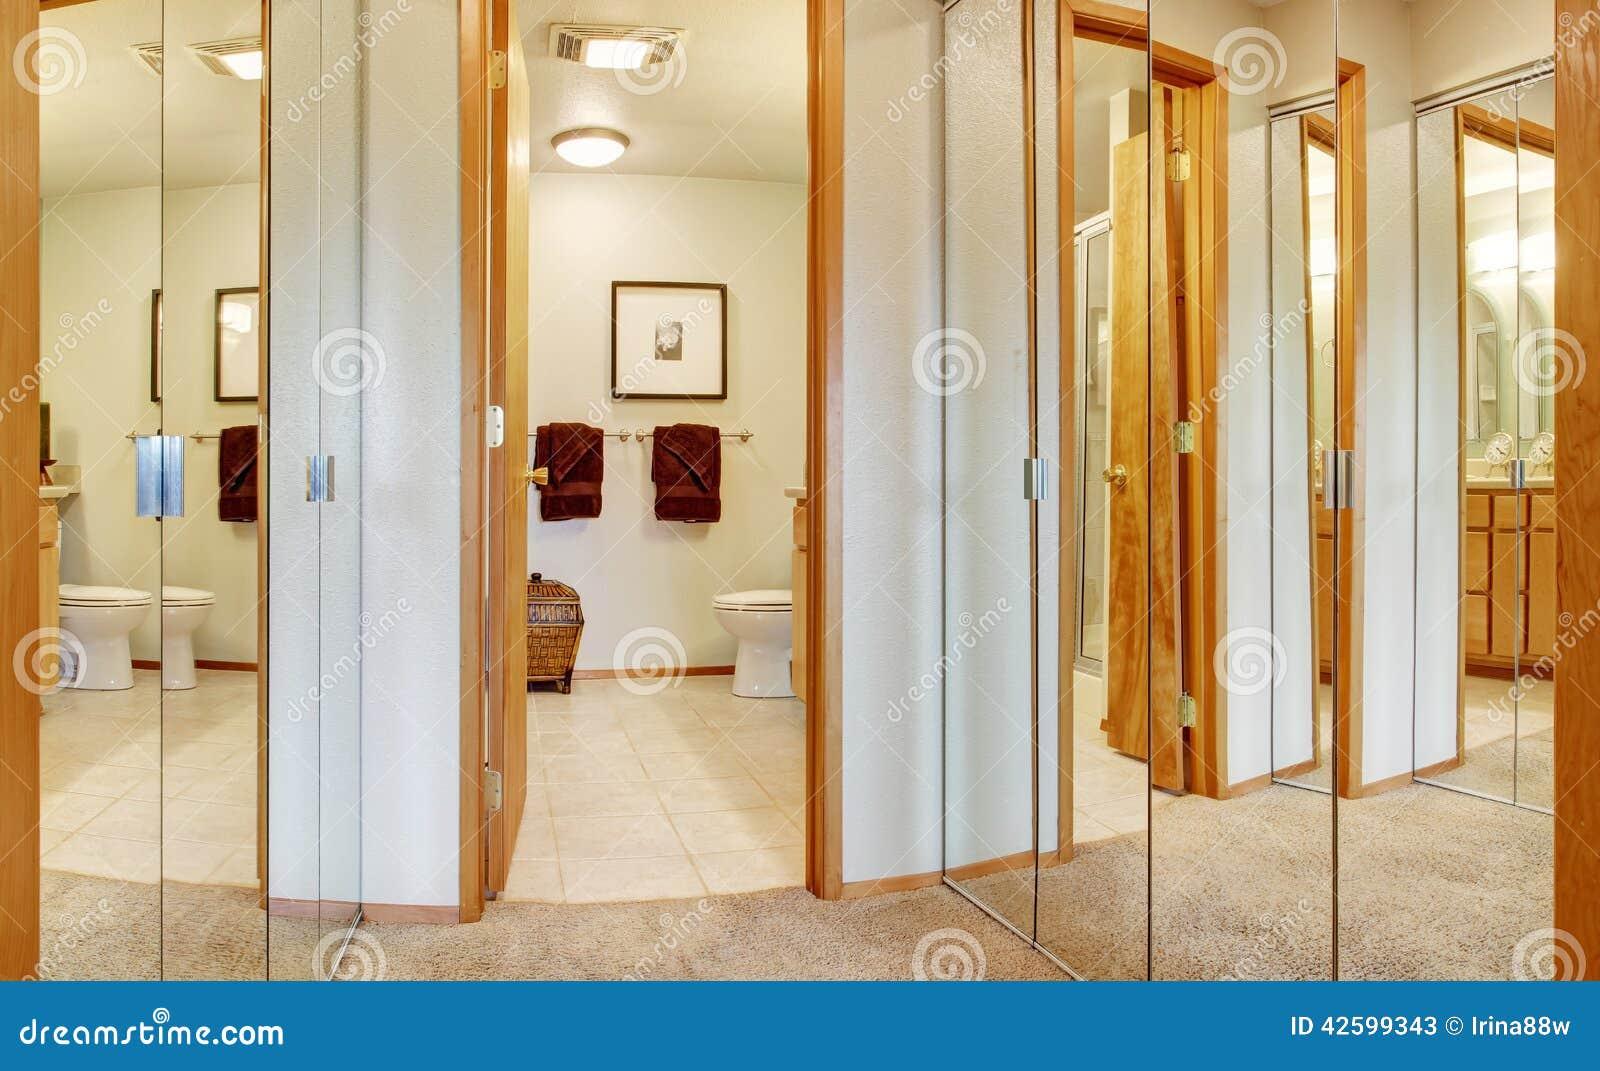 Corridor With Mirror Door Closets And Bathroom View Stock